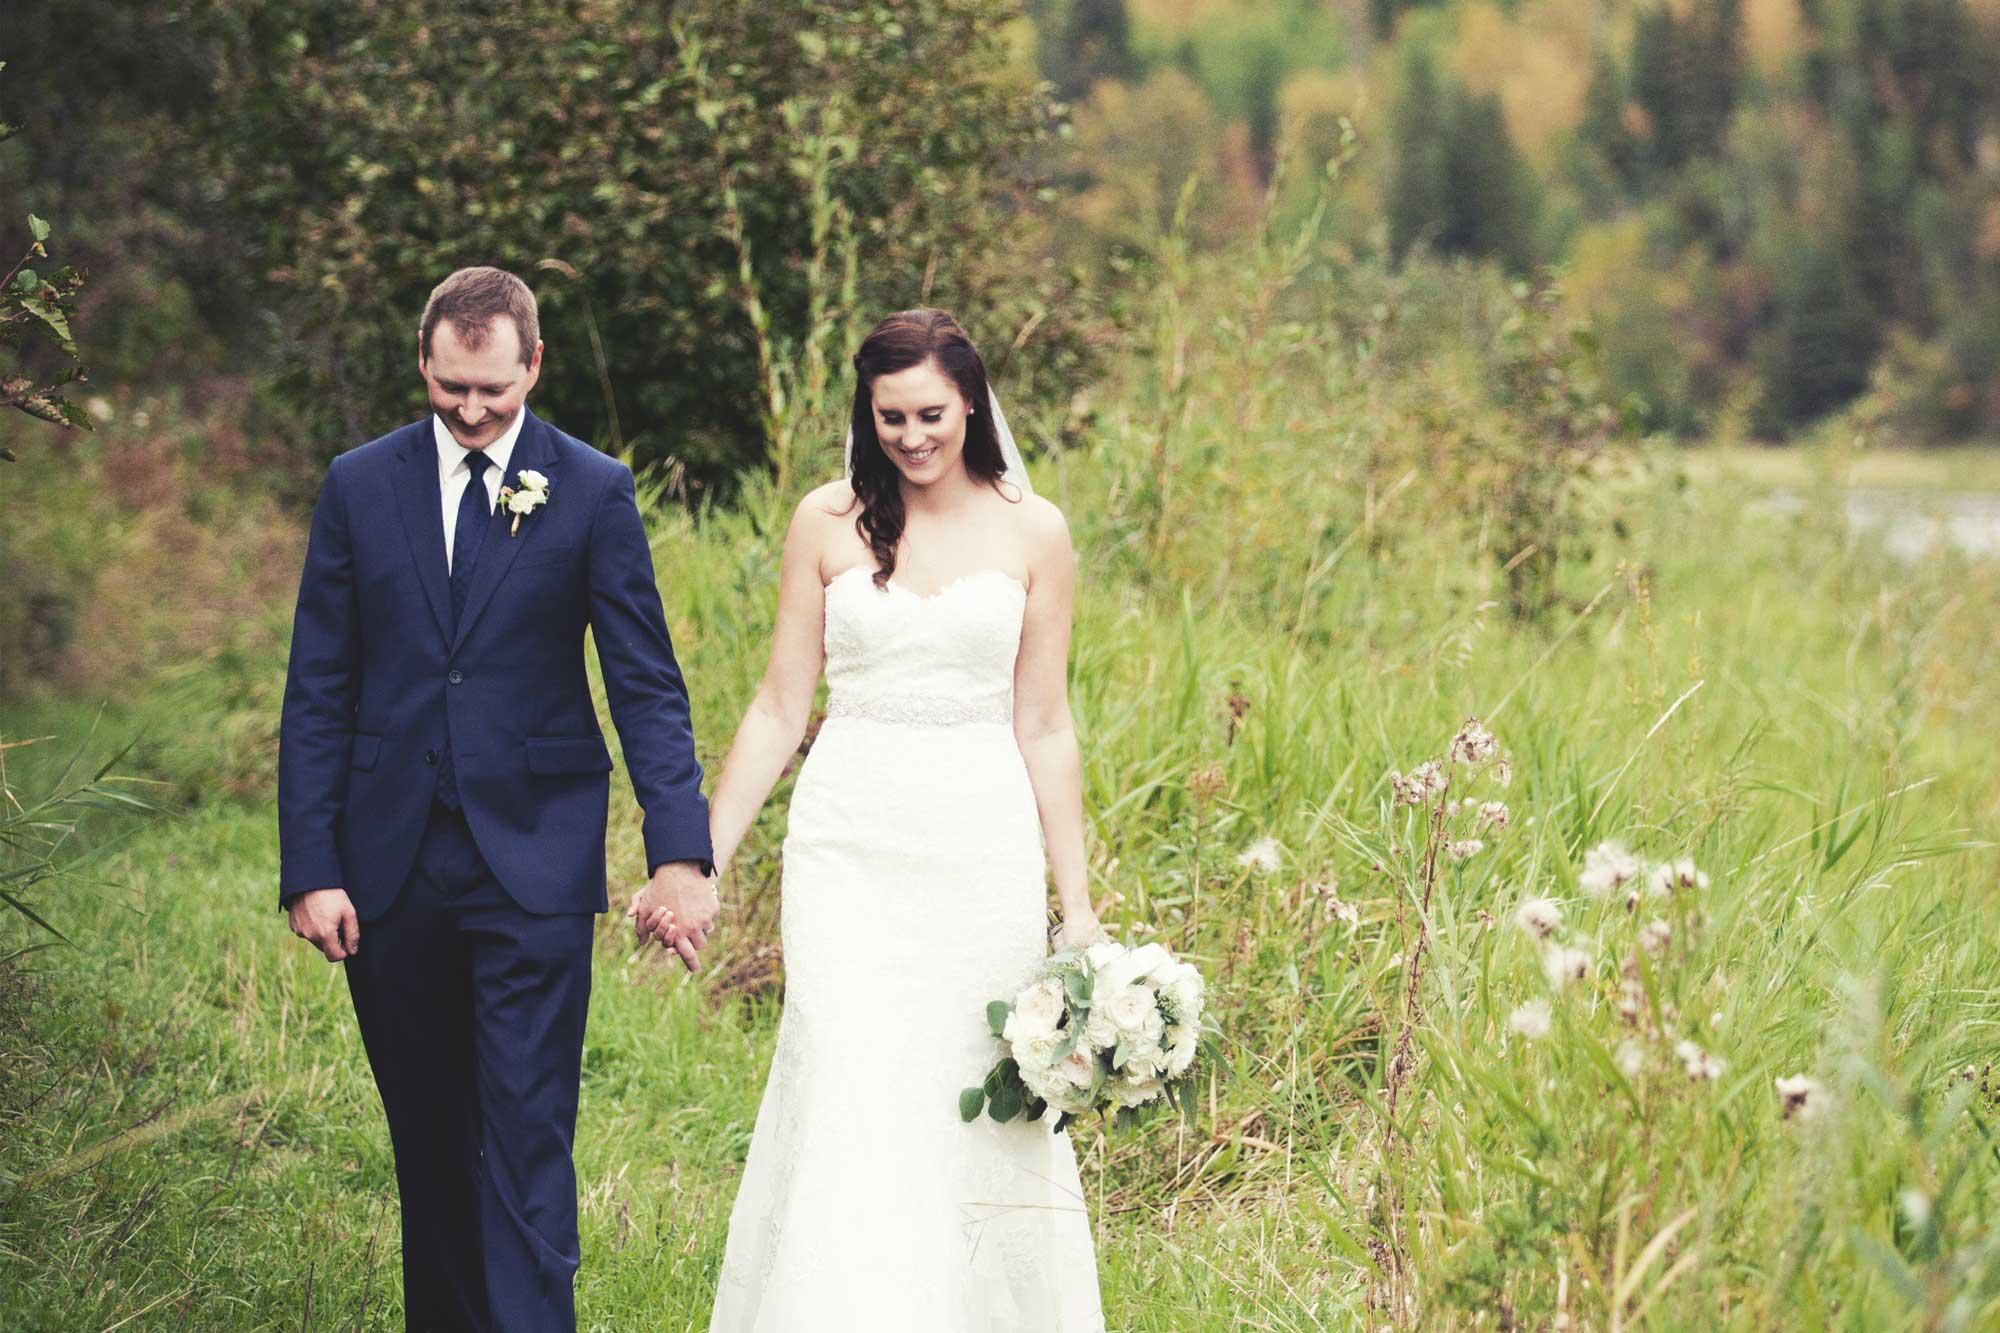 wedding-background-2